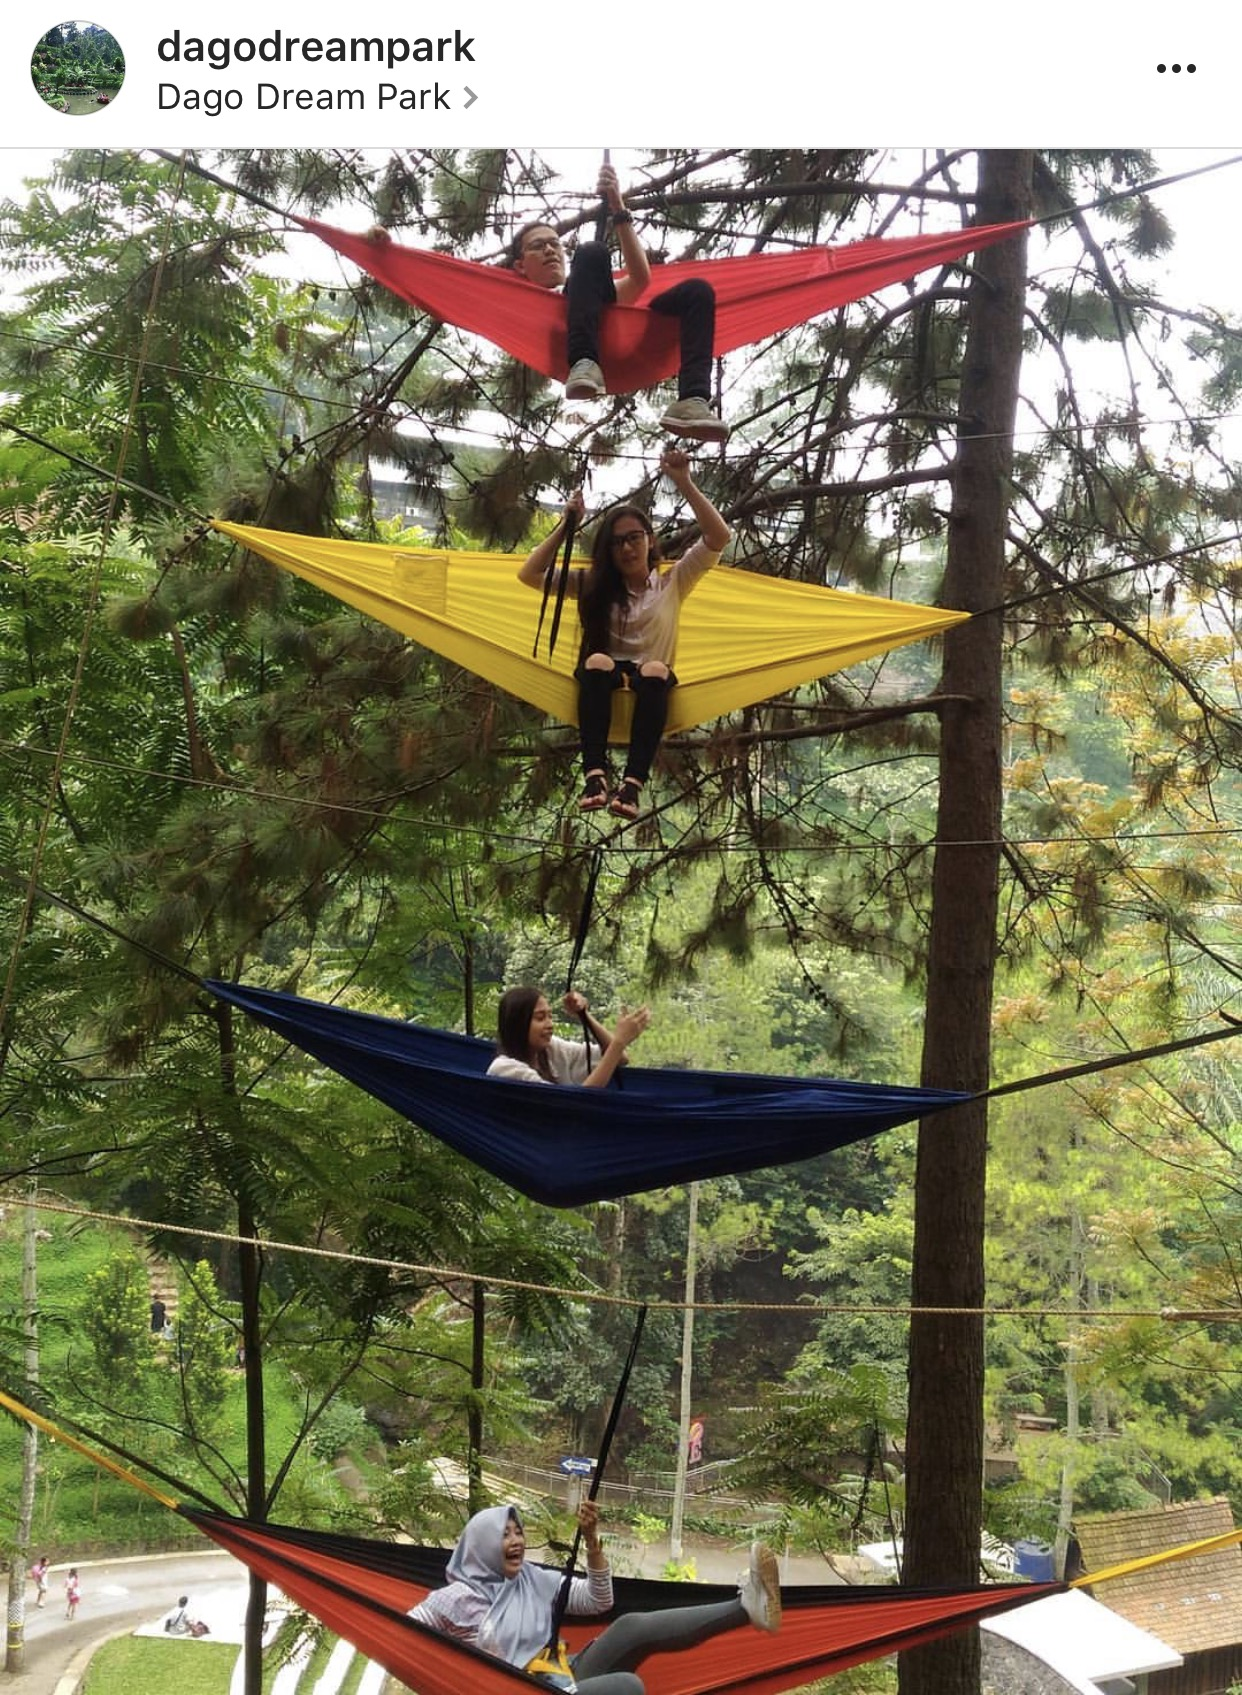 Dago Dream Park Kids Holiday Spots Liburan Anak Informasi